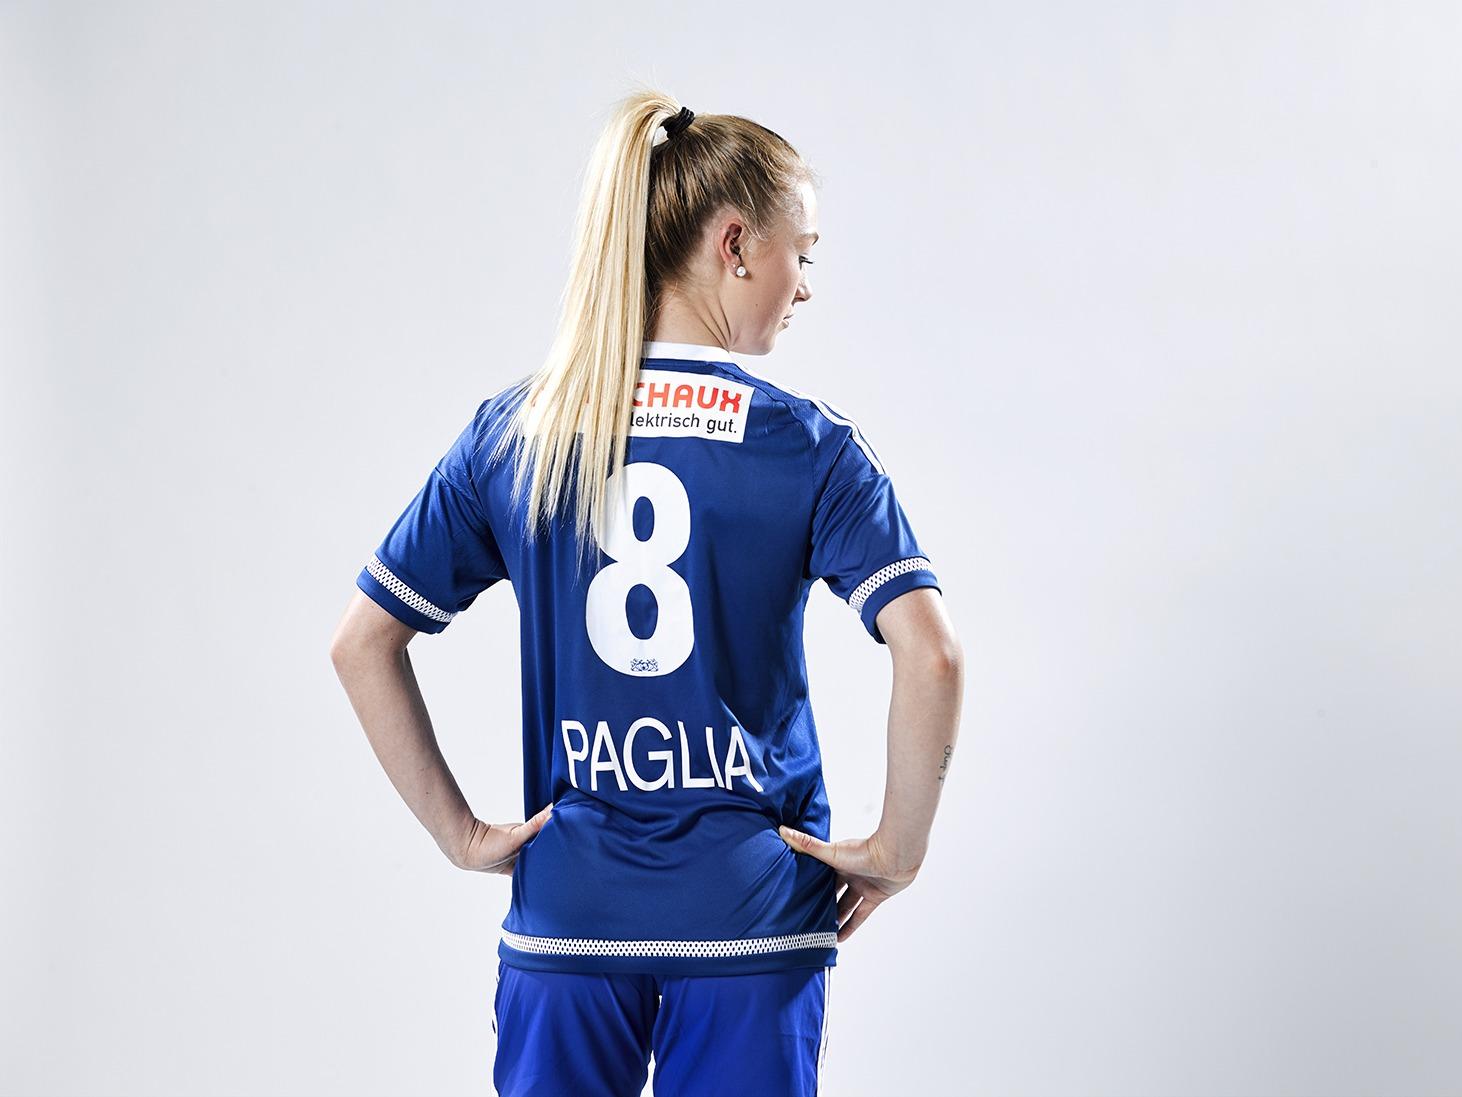 Fabienne Paglia